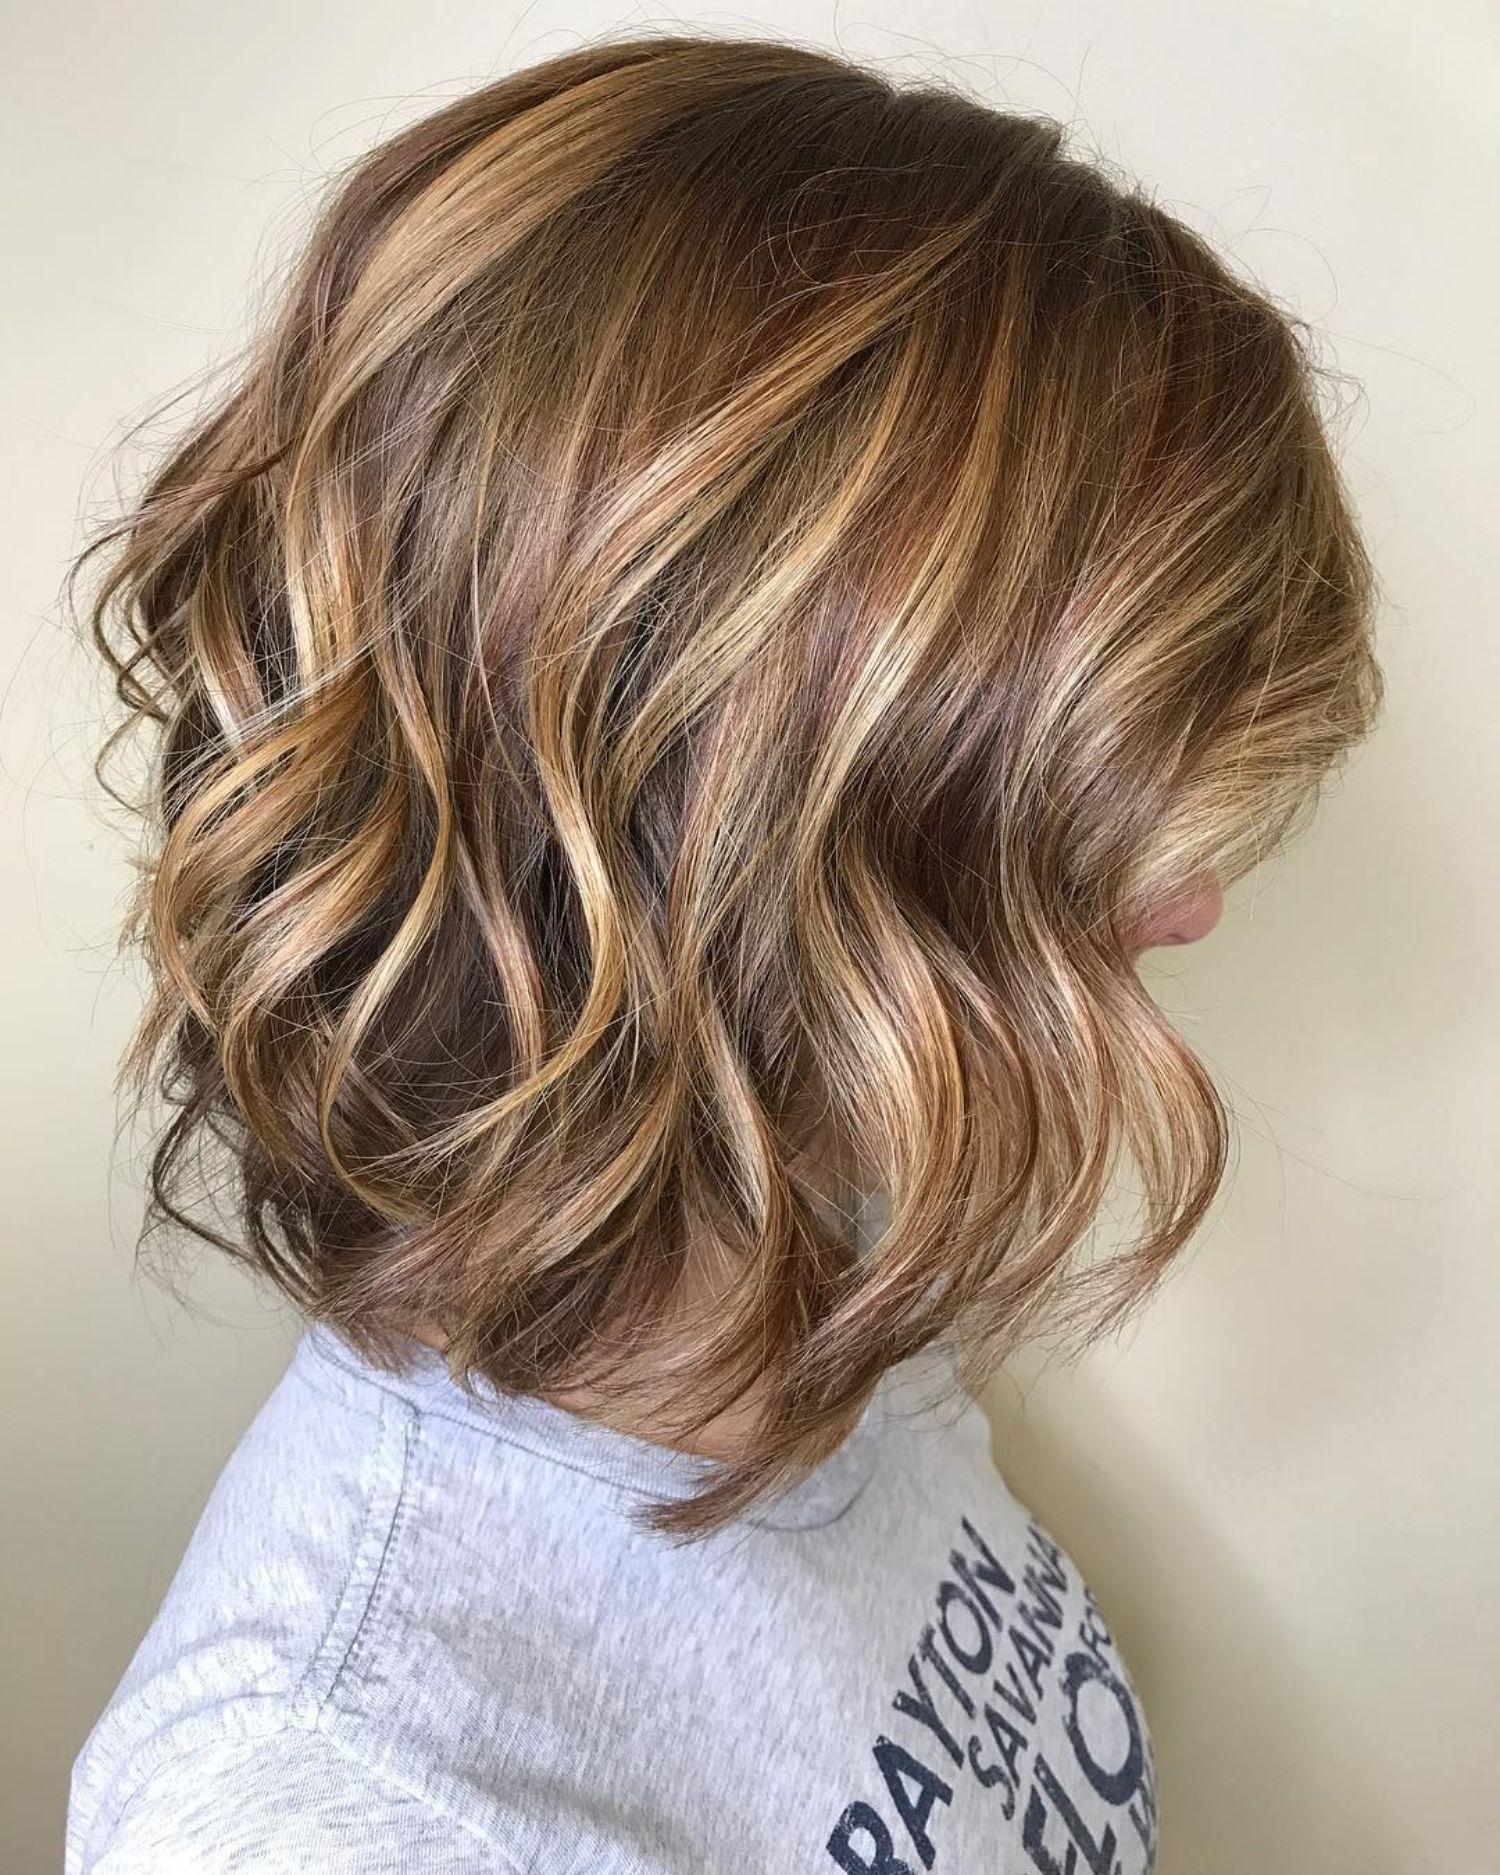 40 Amazing Medium Length Hairstyles Shoulder Length Haircuts 2020 Hair Styles Blonde Hair With Highlights Hair Lengths